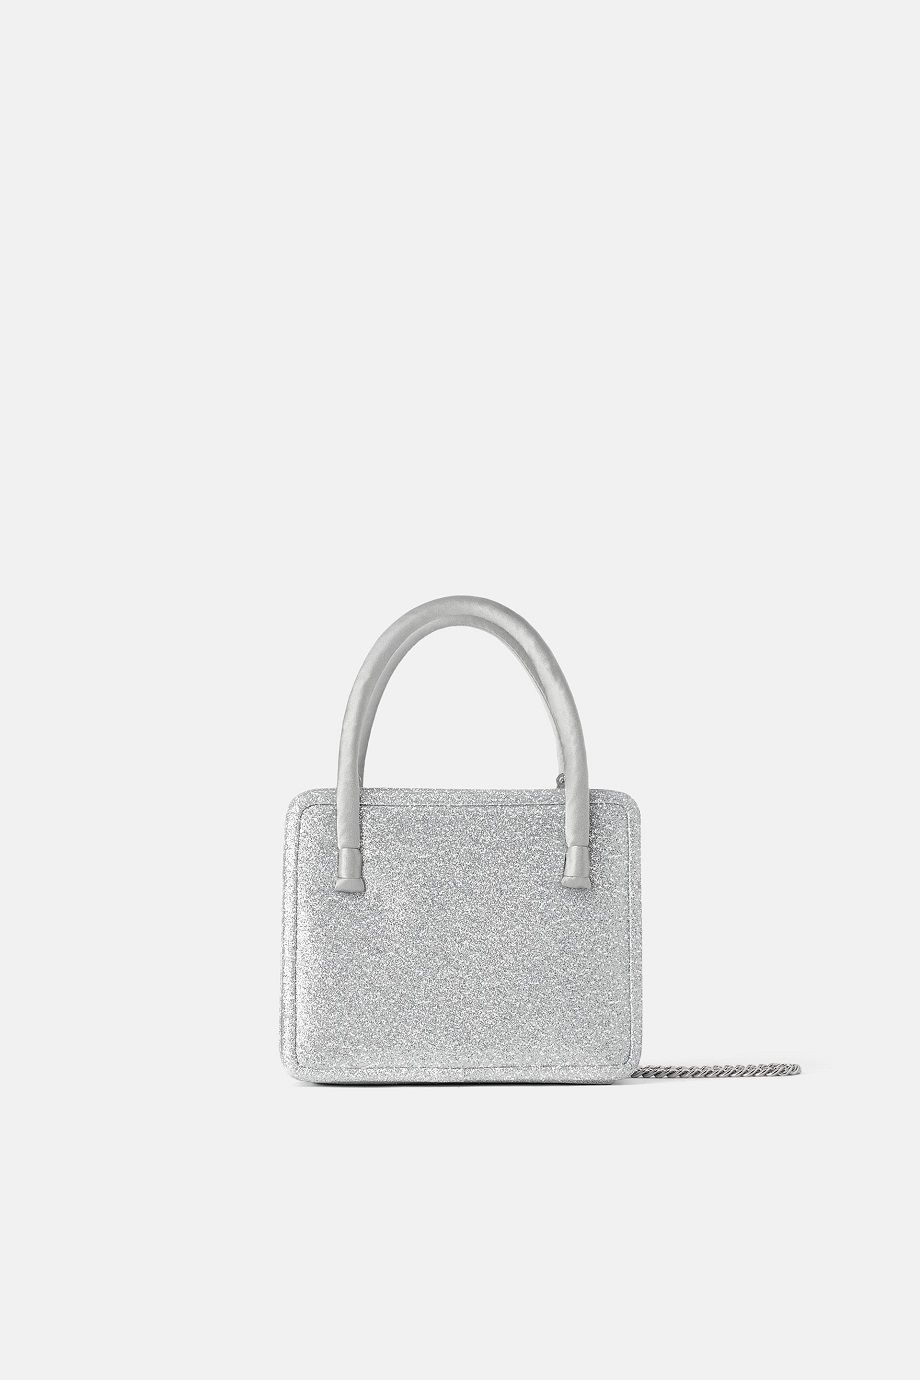 #PopbelaOOTD: Upgrade Tas Pesta dengan Detail yang Catchy